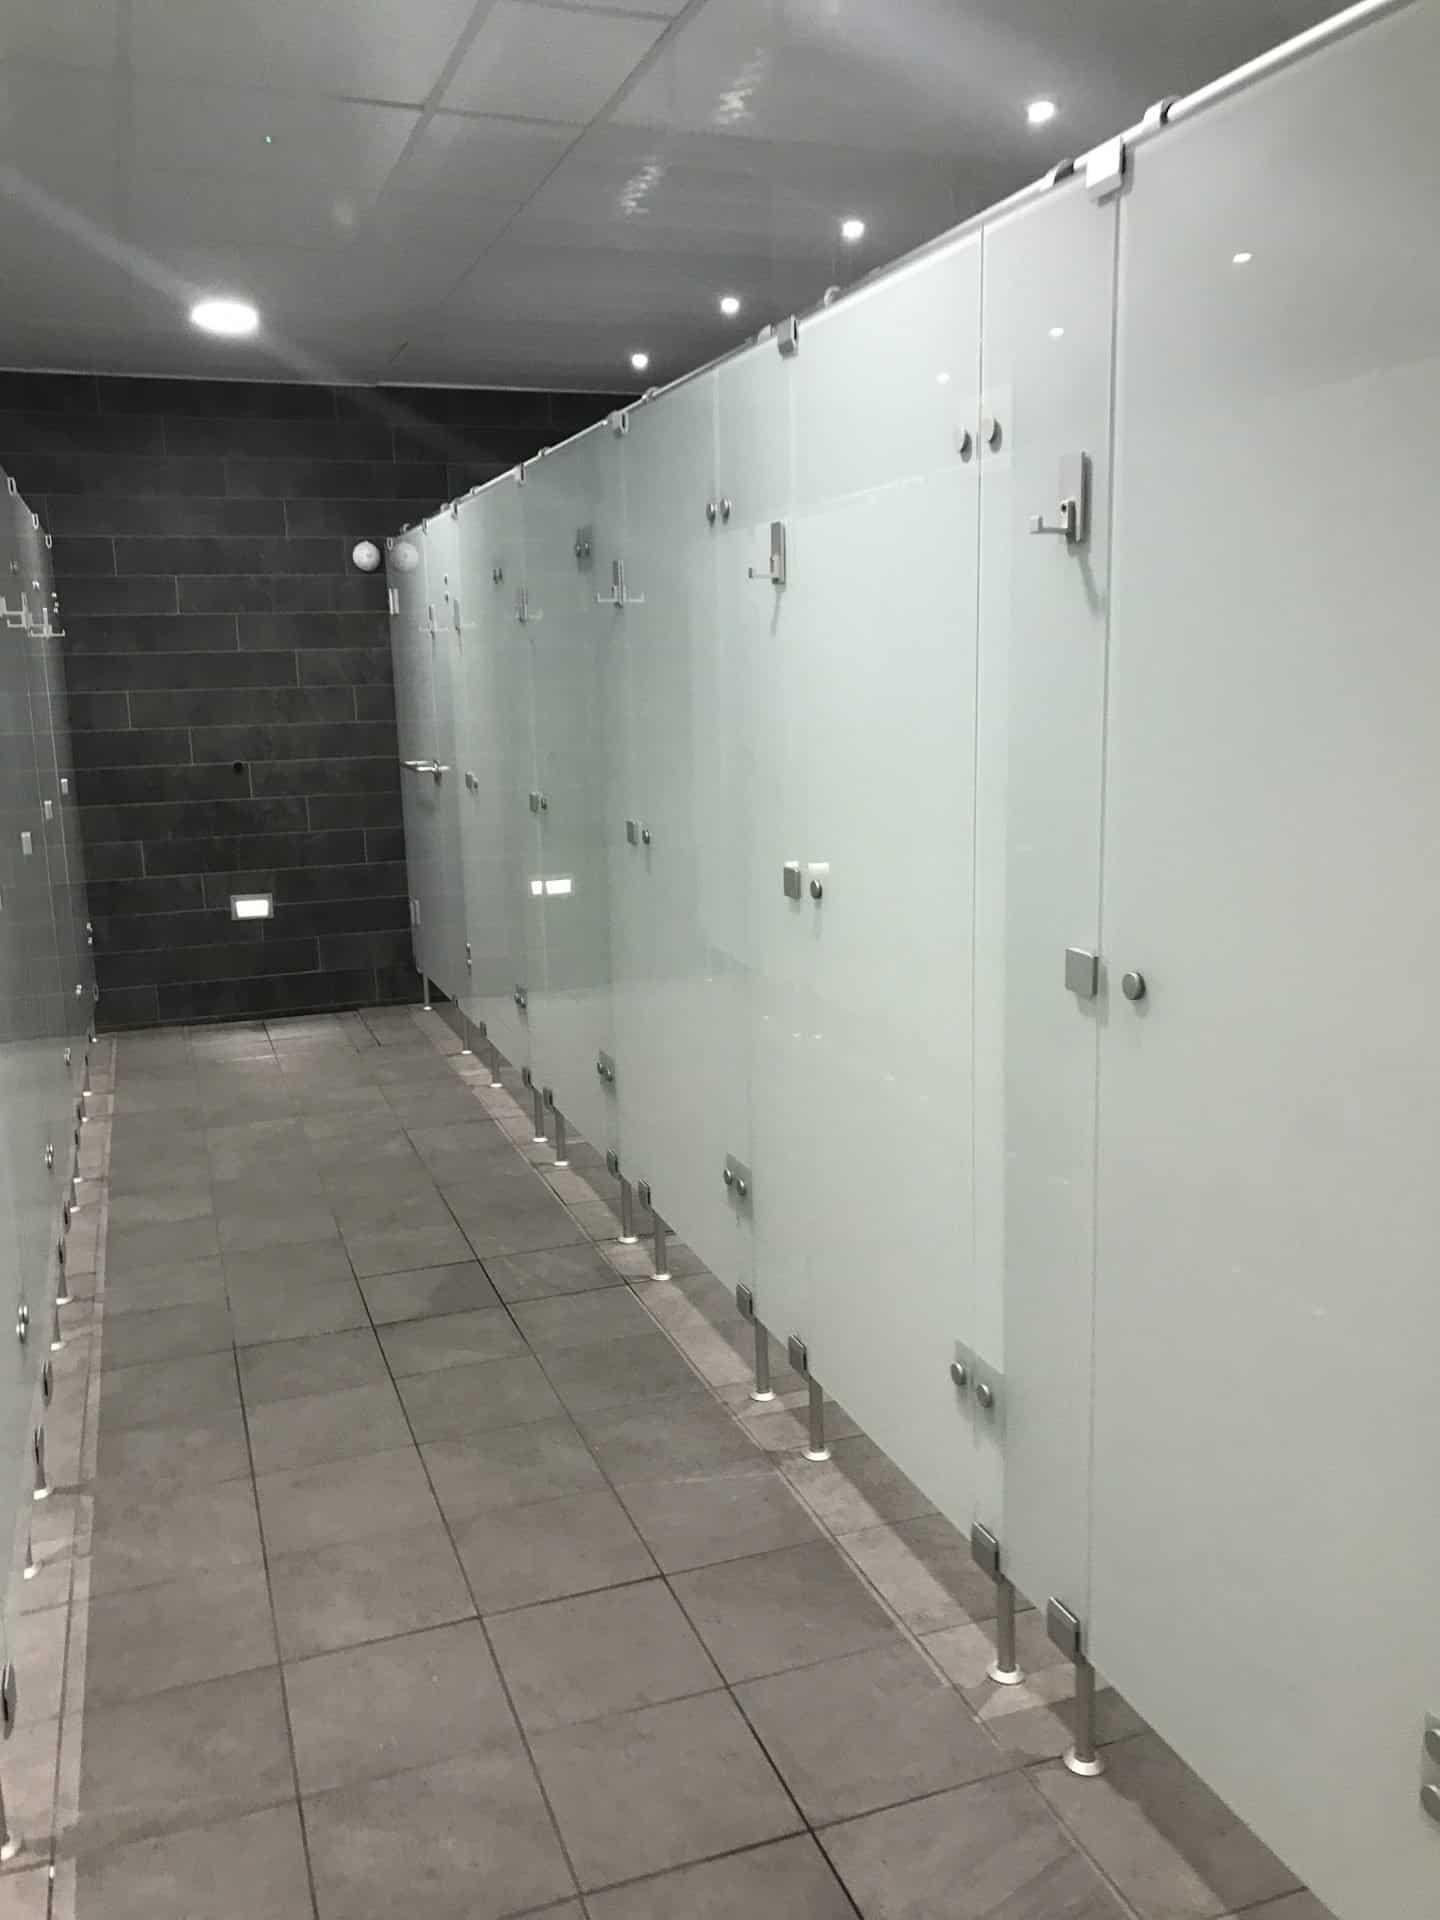 Showers at David Lloyd Milton Keynes